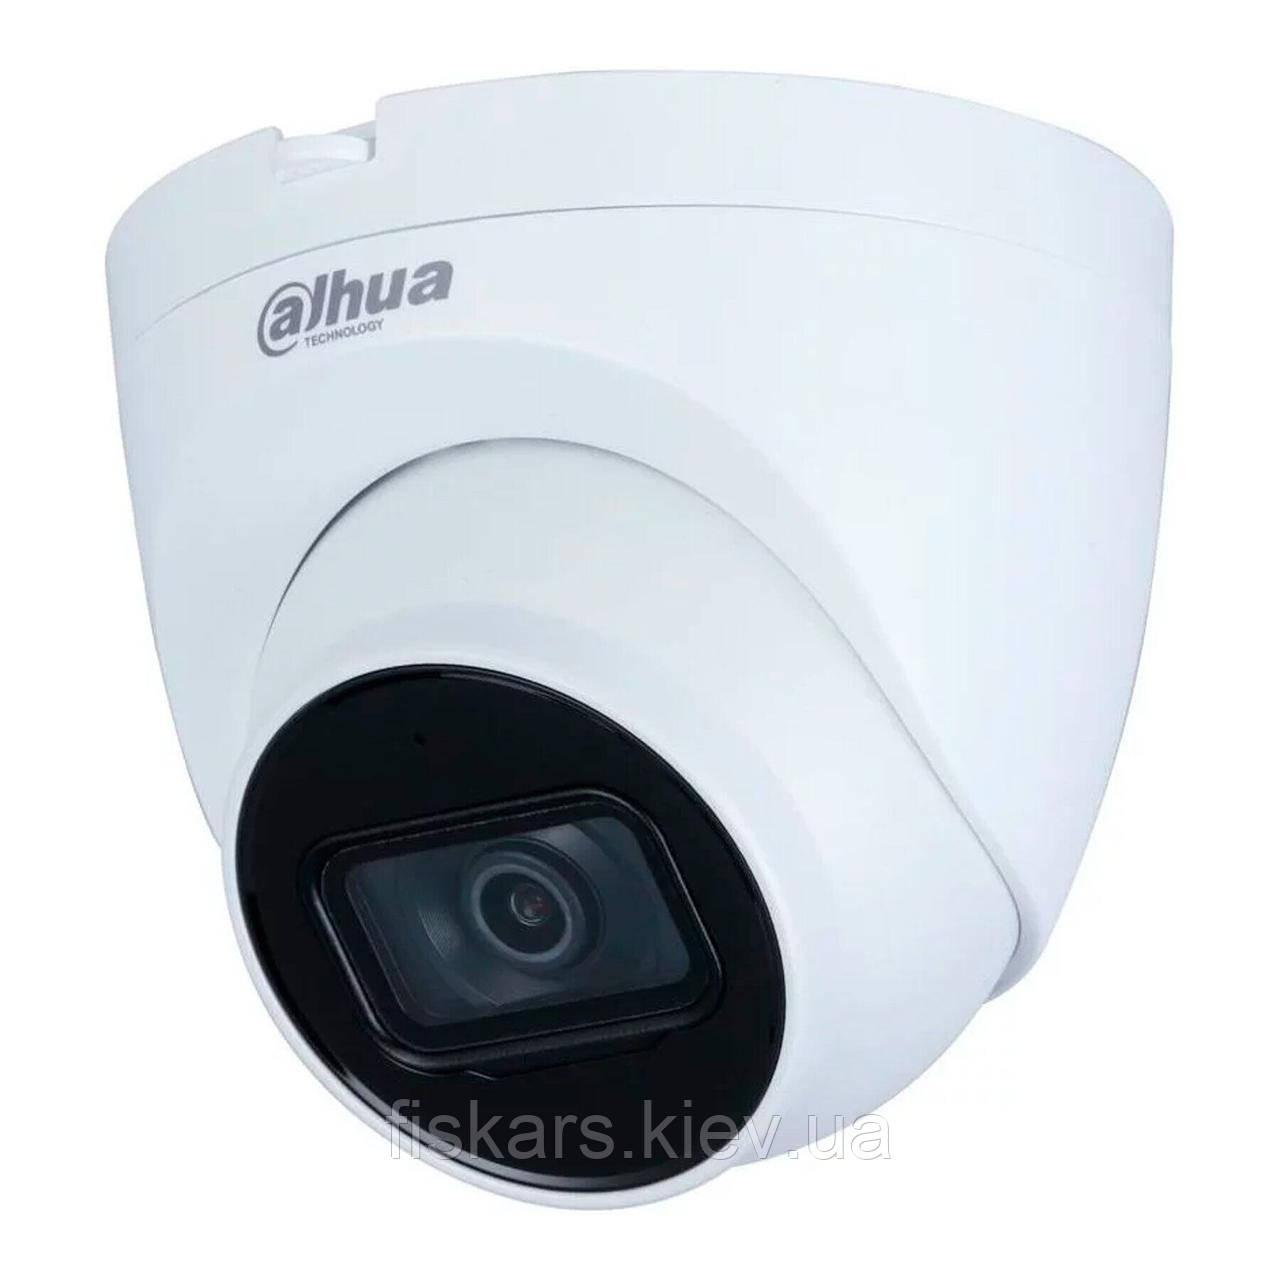 5 Mп купольная IP камера Dahua DH-IPC-HDW2531TP-AS-S2